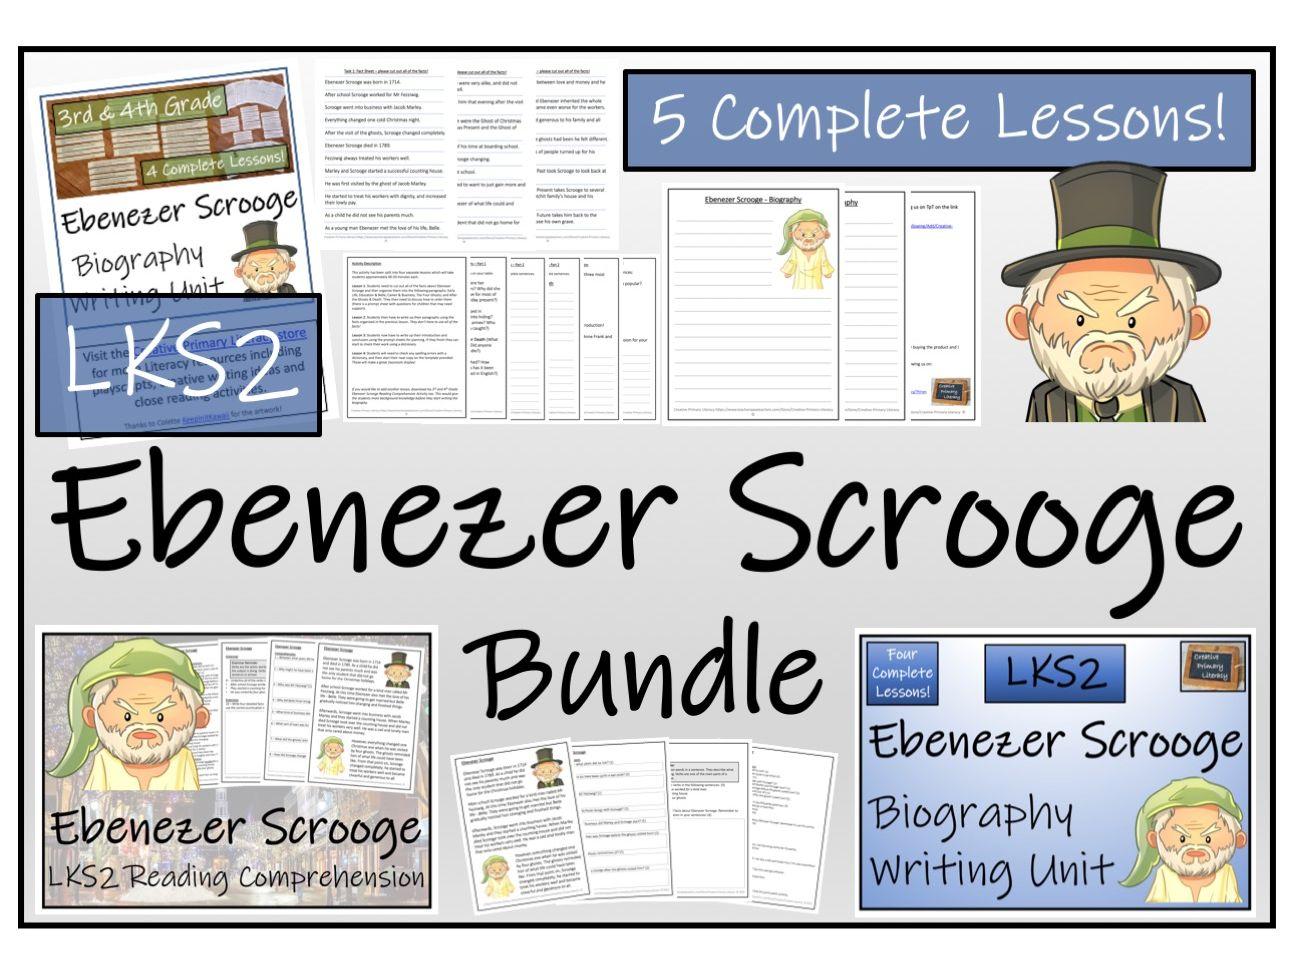 LKS2 Literacy - Ebenezer Scrooge Reading Comprehension & Biography Bundle